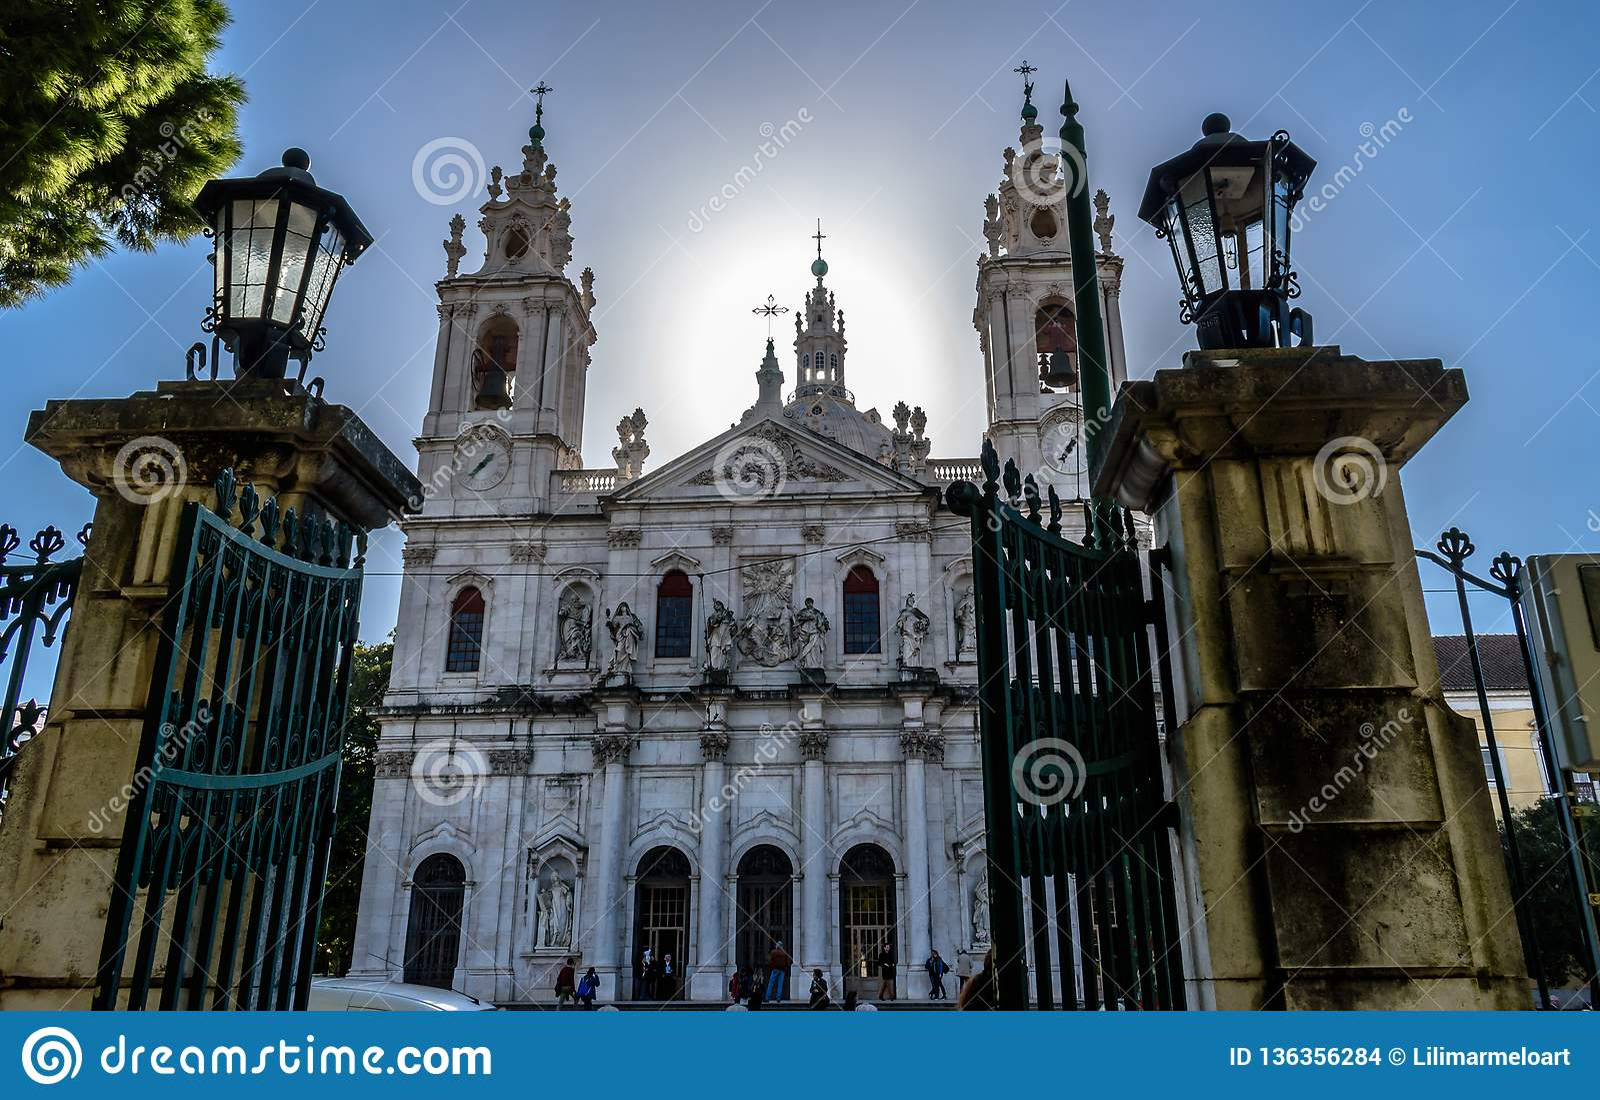 La vue à la basilique DA Estrela a encadré par les portes de Jardim DA Estrela, Lapa - Portugal